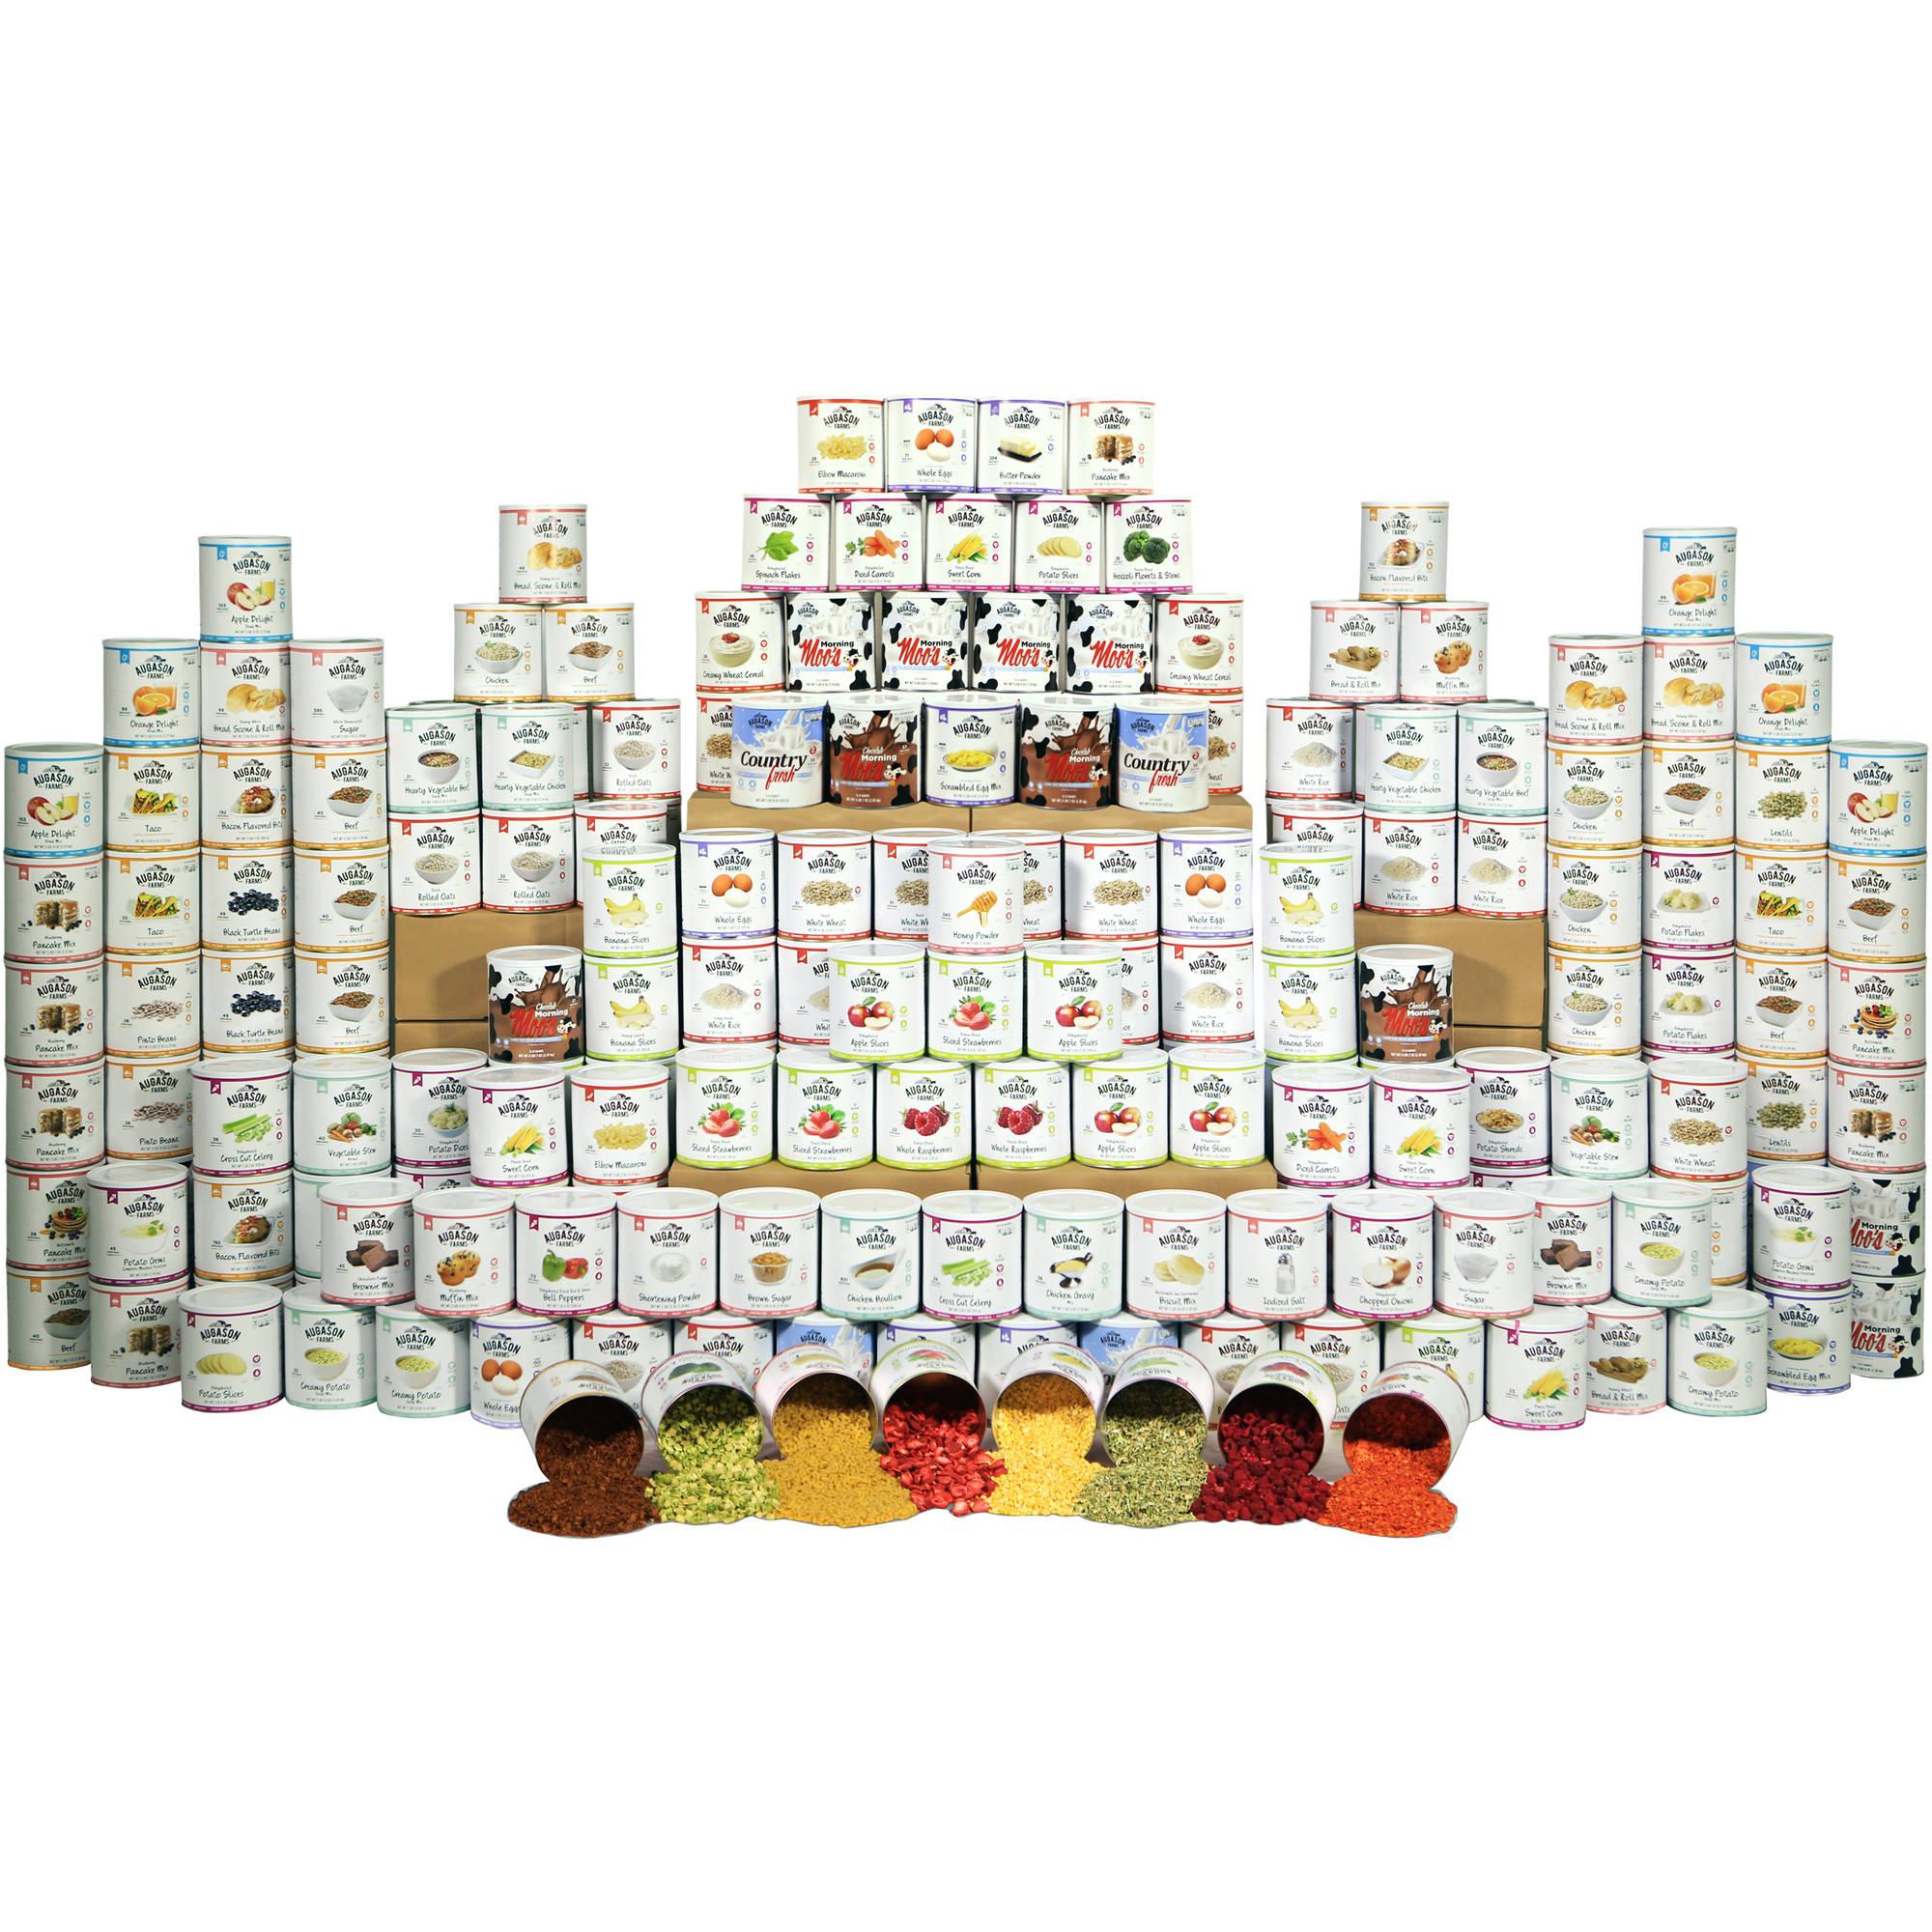 Augason Farms Emergency Food Premium 4 Person 1 Year Food Storage Kit